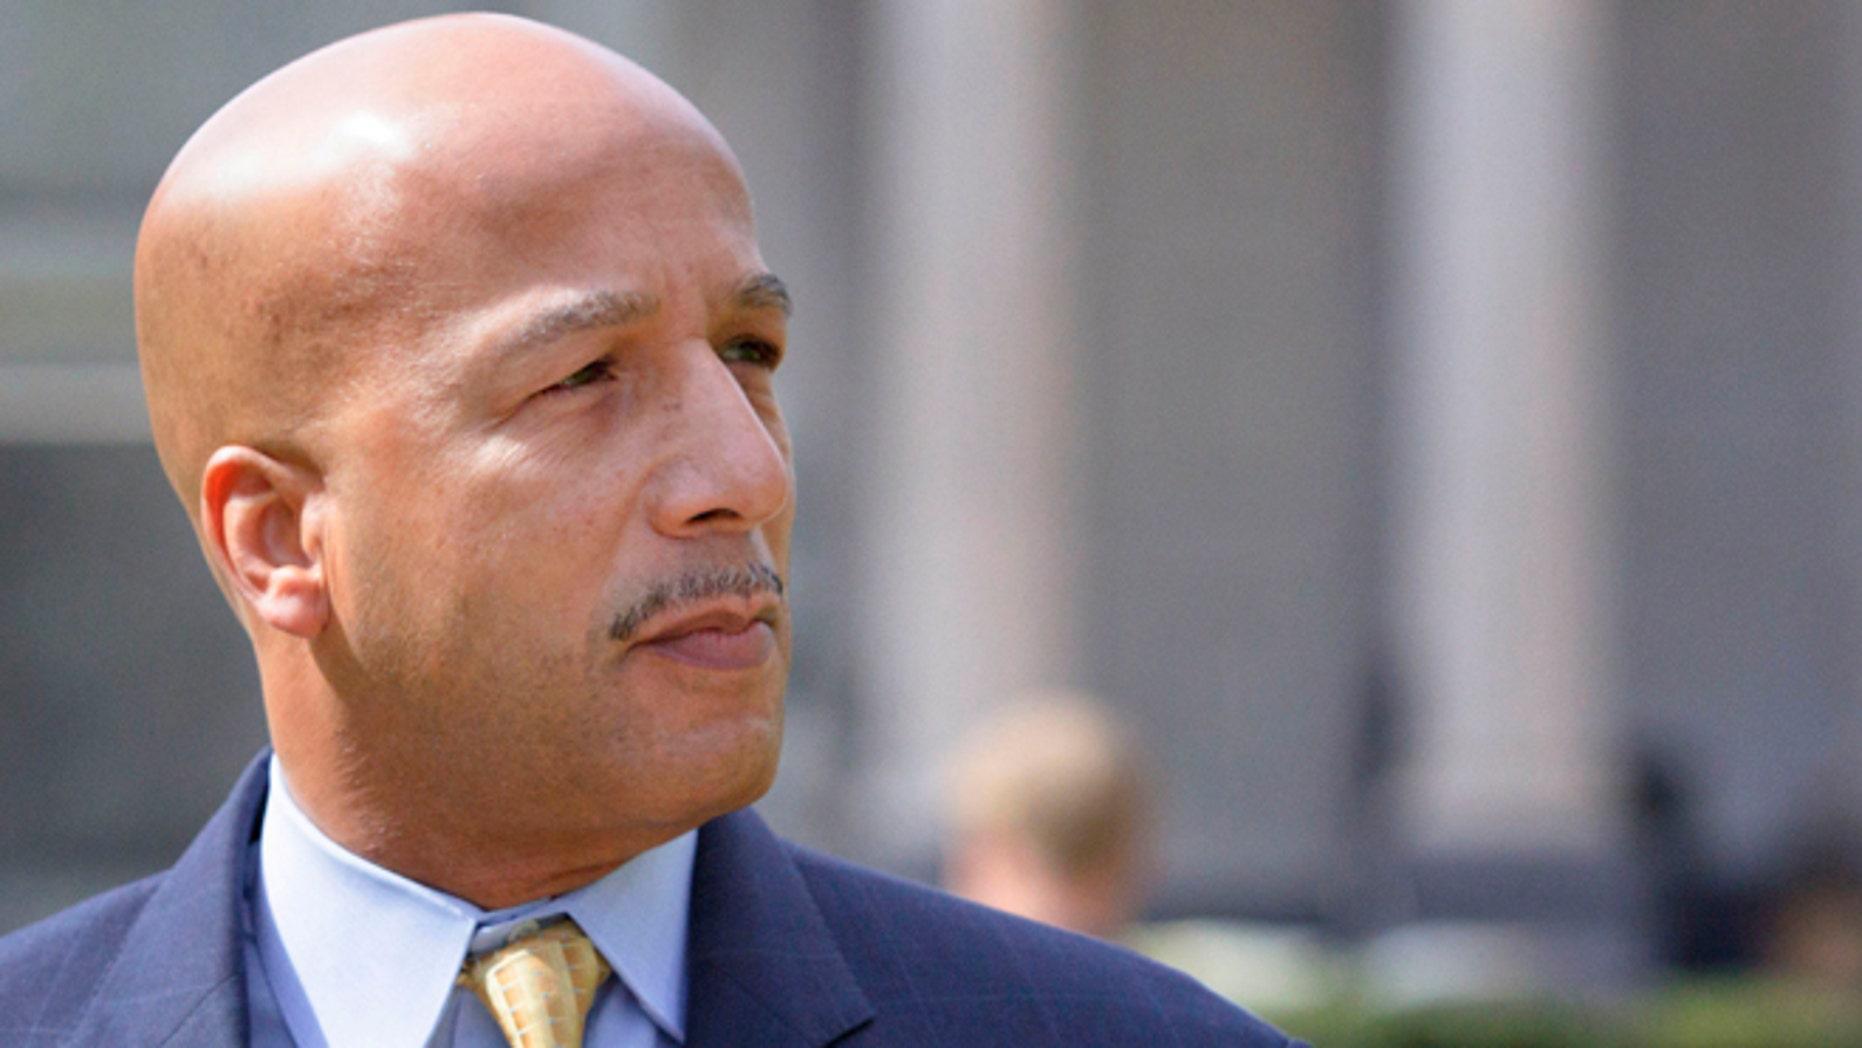 Feb. 20, 2013: Former New Orleans Mayor C. Ray Nagin.